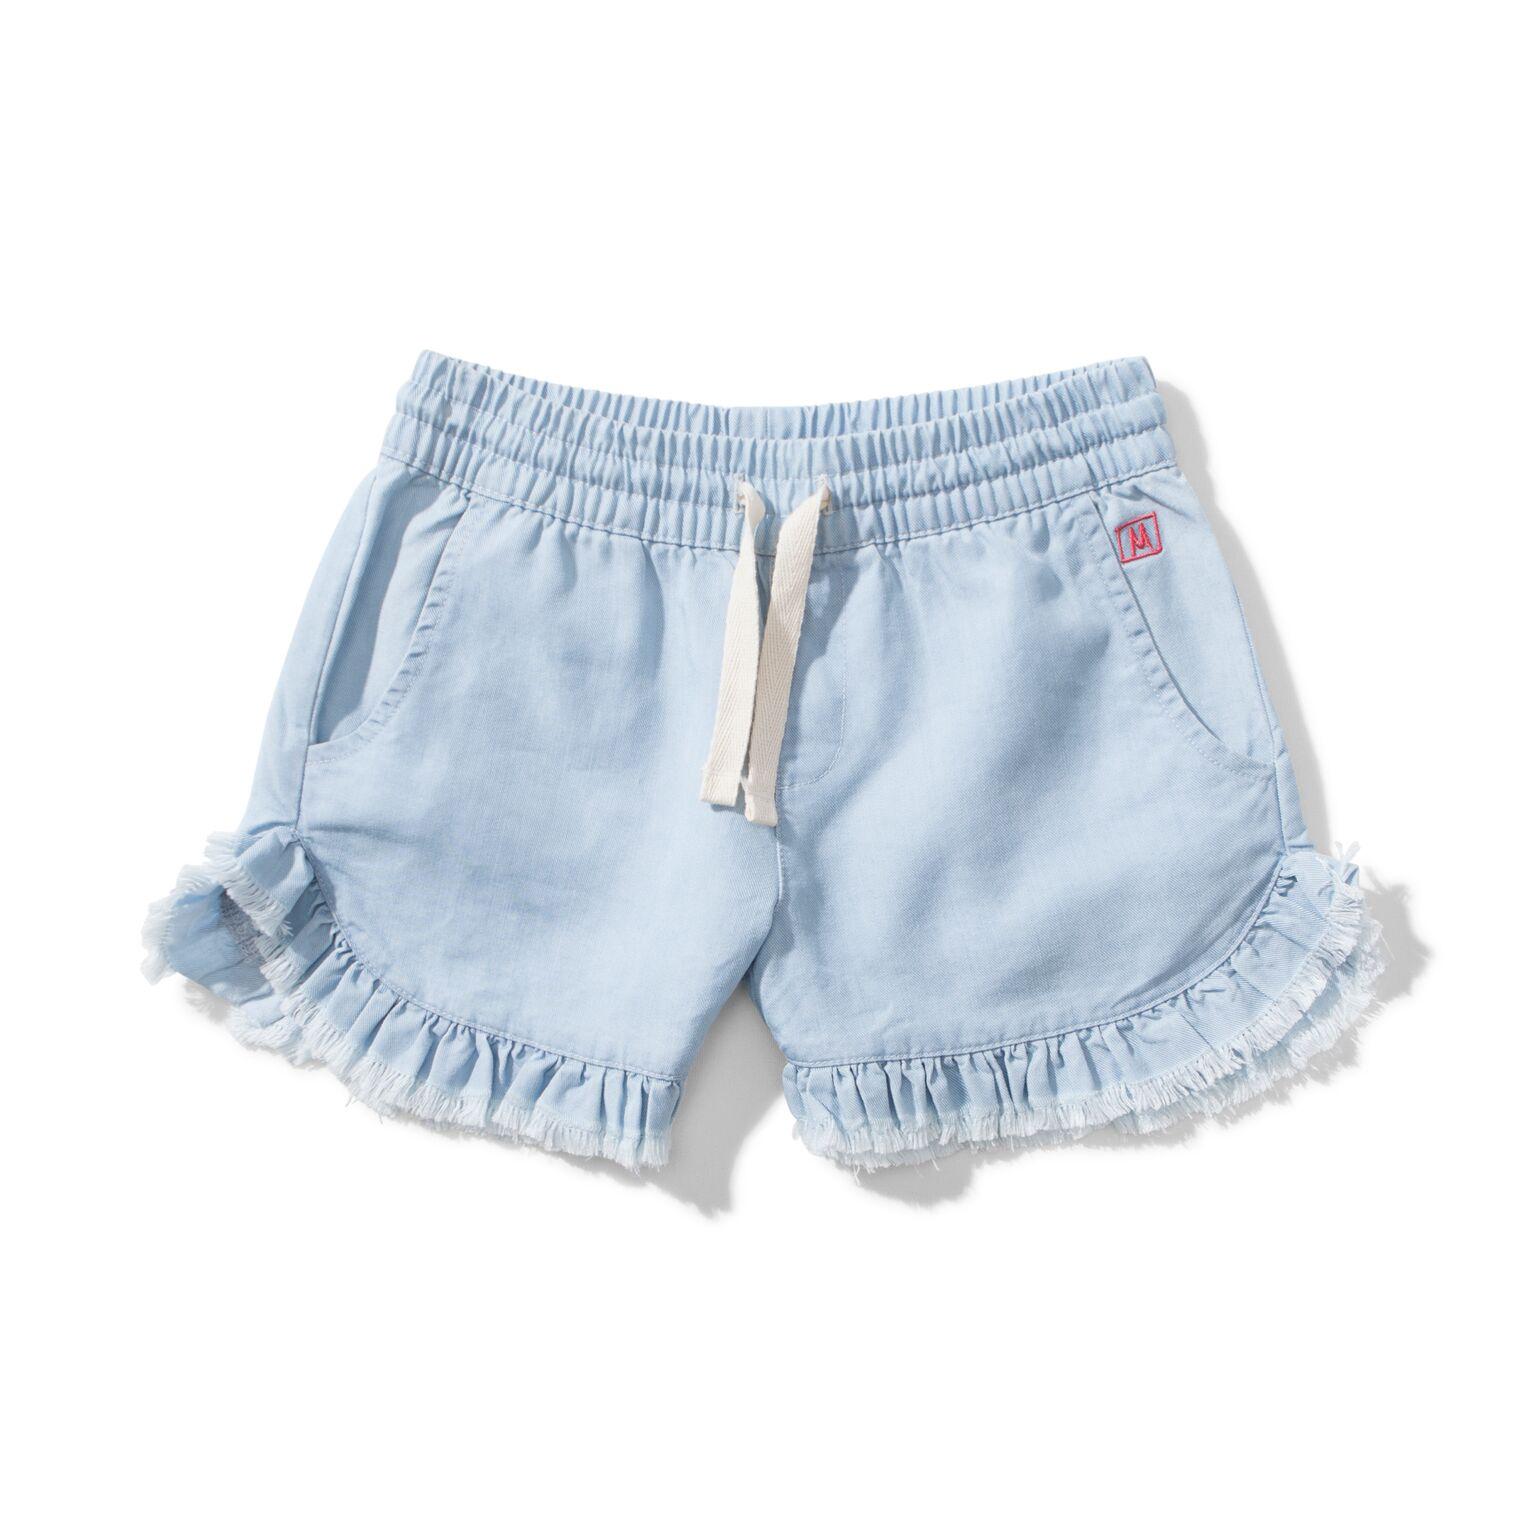 Missie Munster Espi Frill Walk Shorts